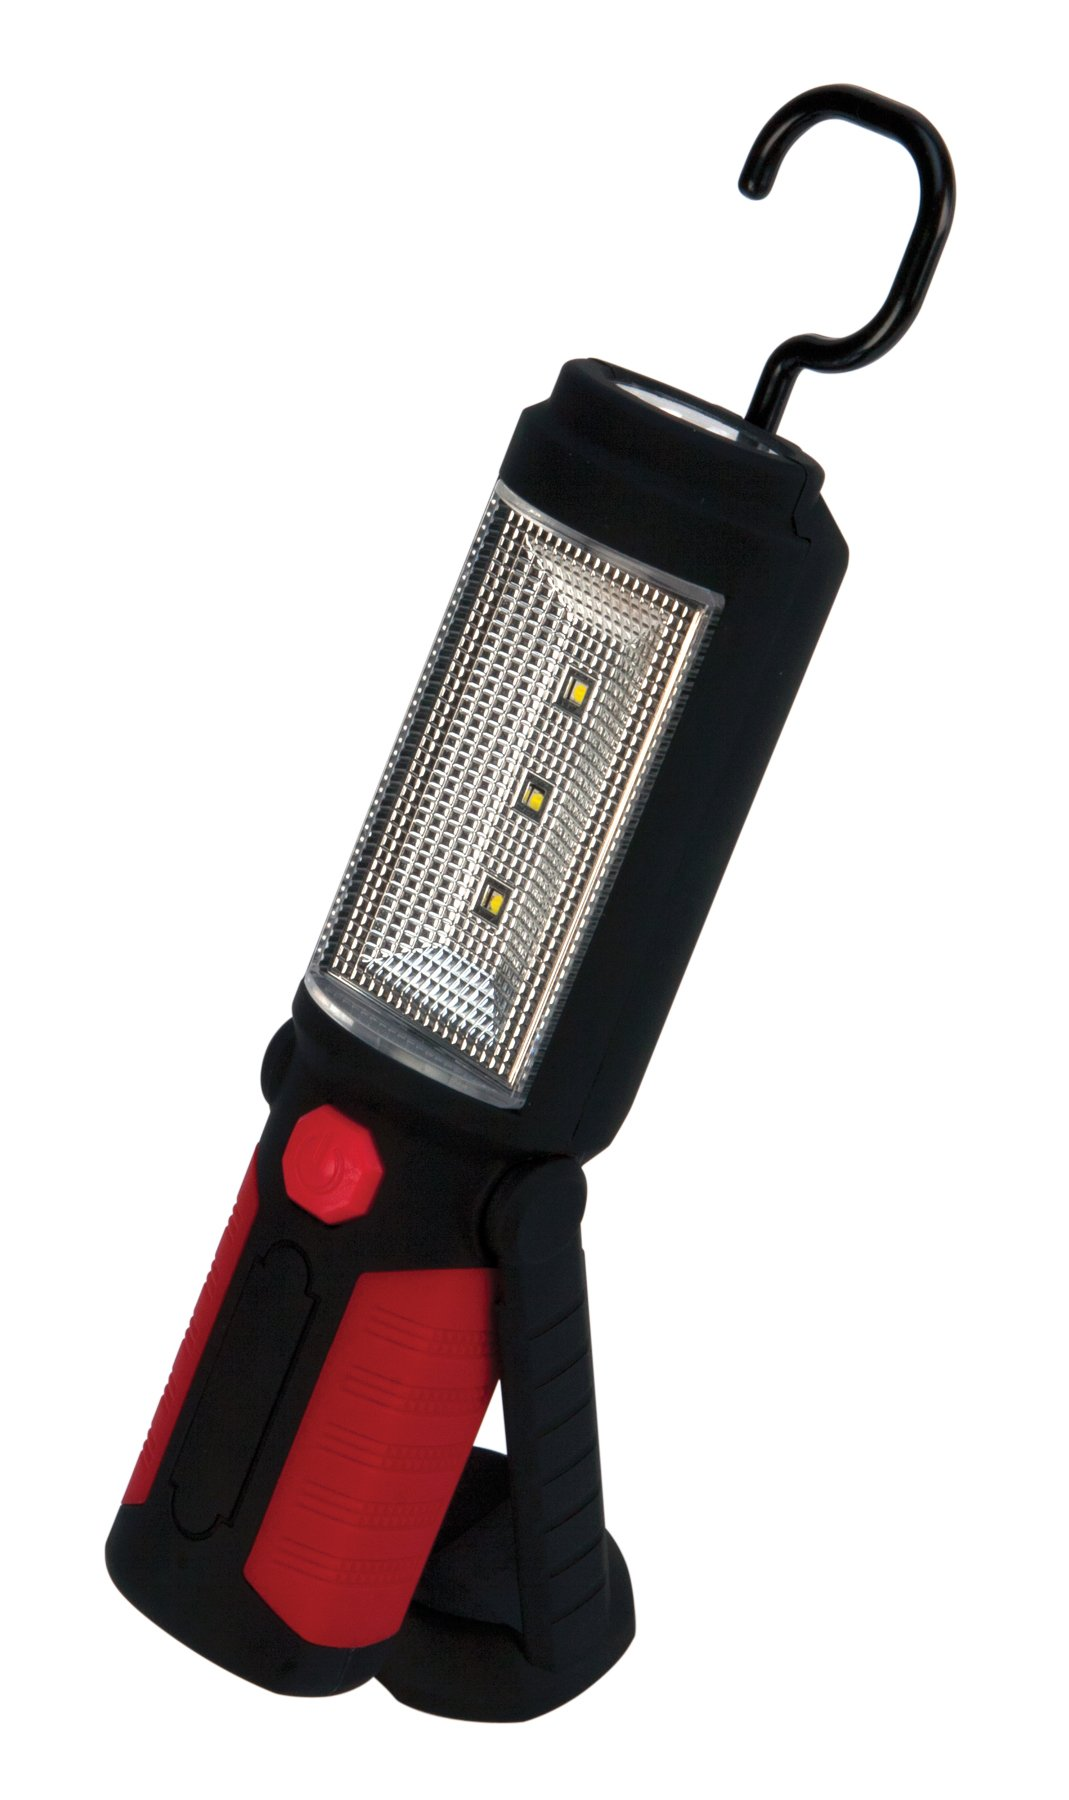 Performance Tool W2358  133 Lumen Multi Function 3 + 1 LED Work Light (Sold as 1 Flashlight)